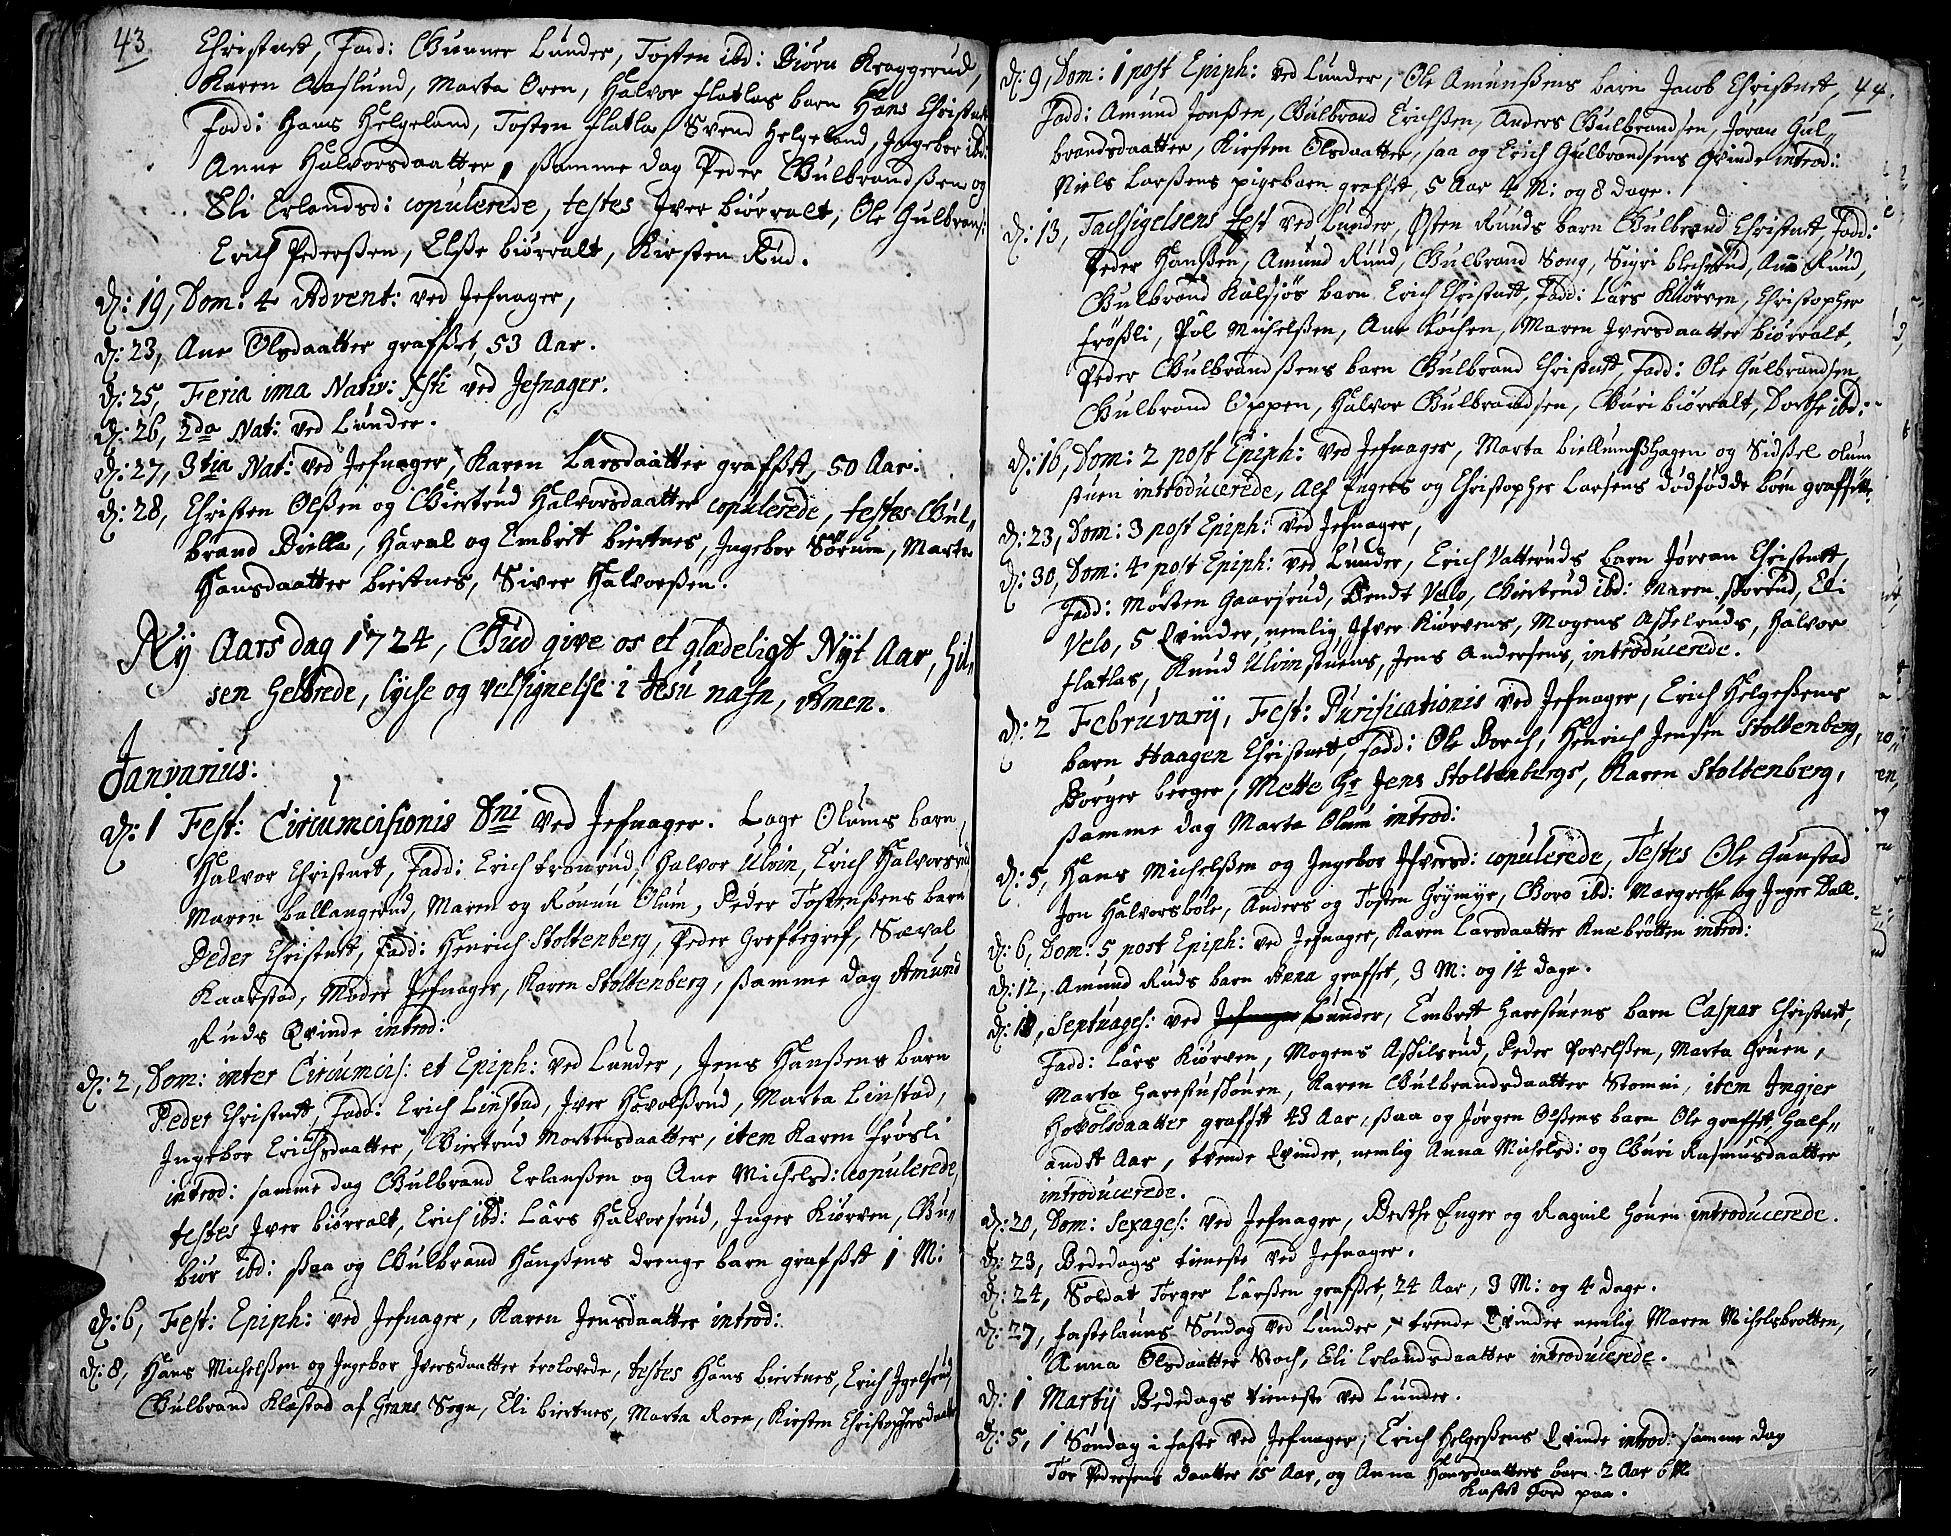 SAH, Jevnaker prestekontor, Ministerialbok nr. 1, 1718-1725, s. 43-44